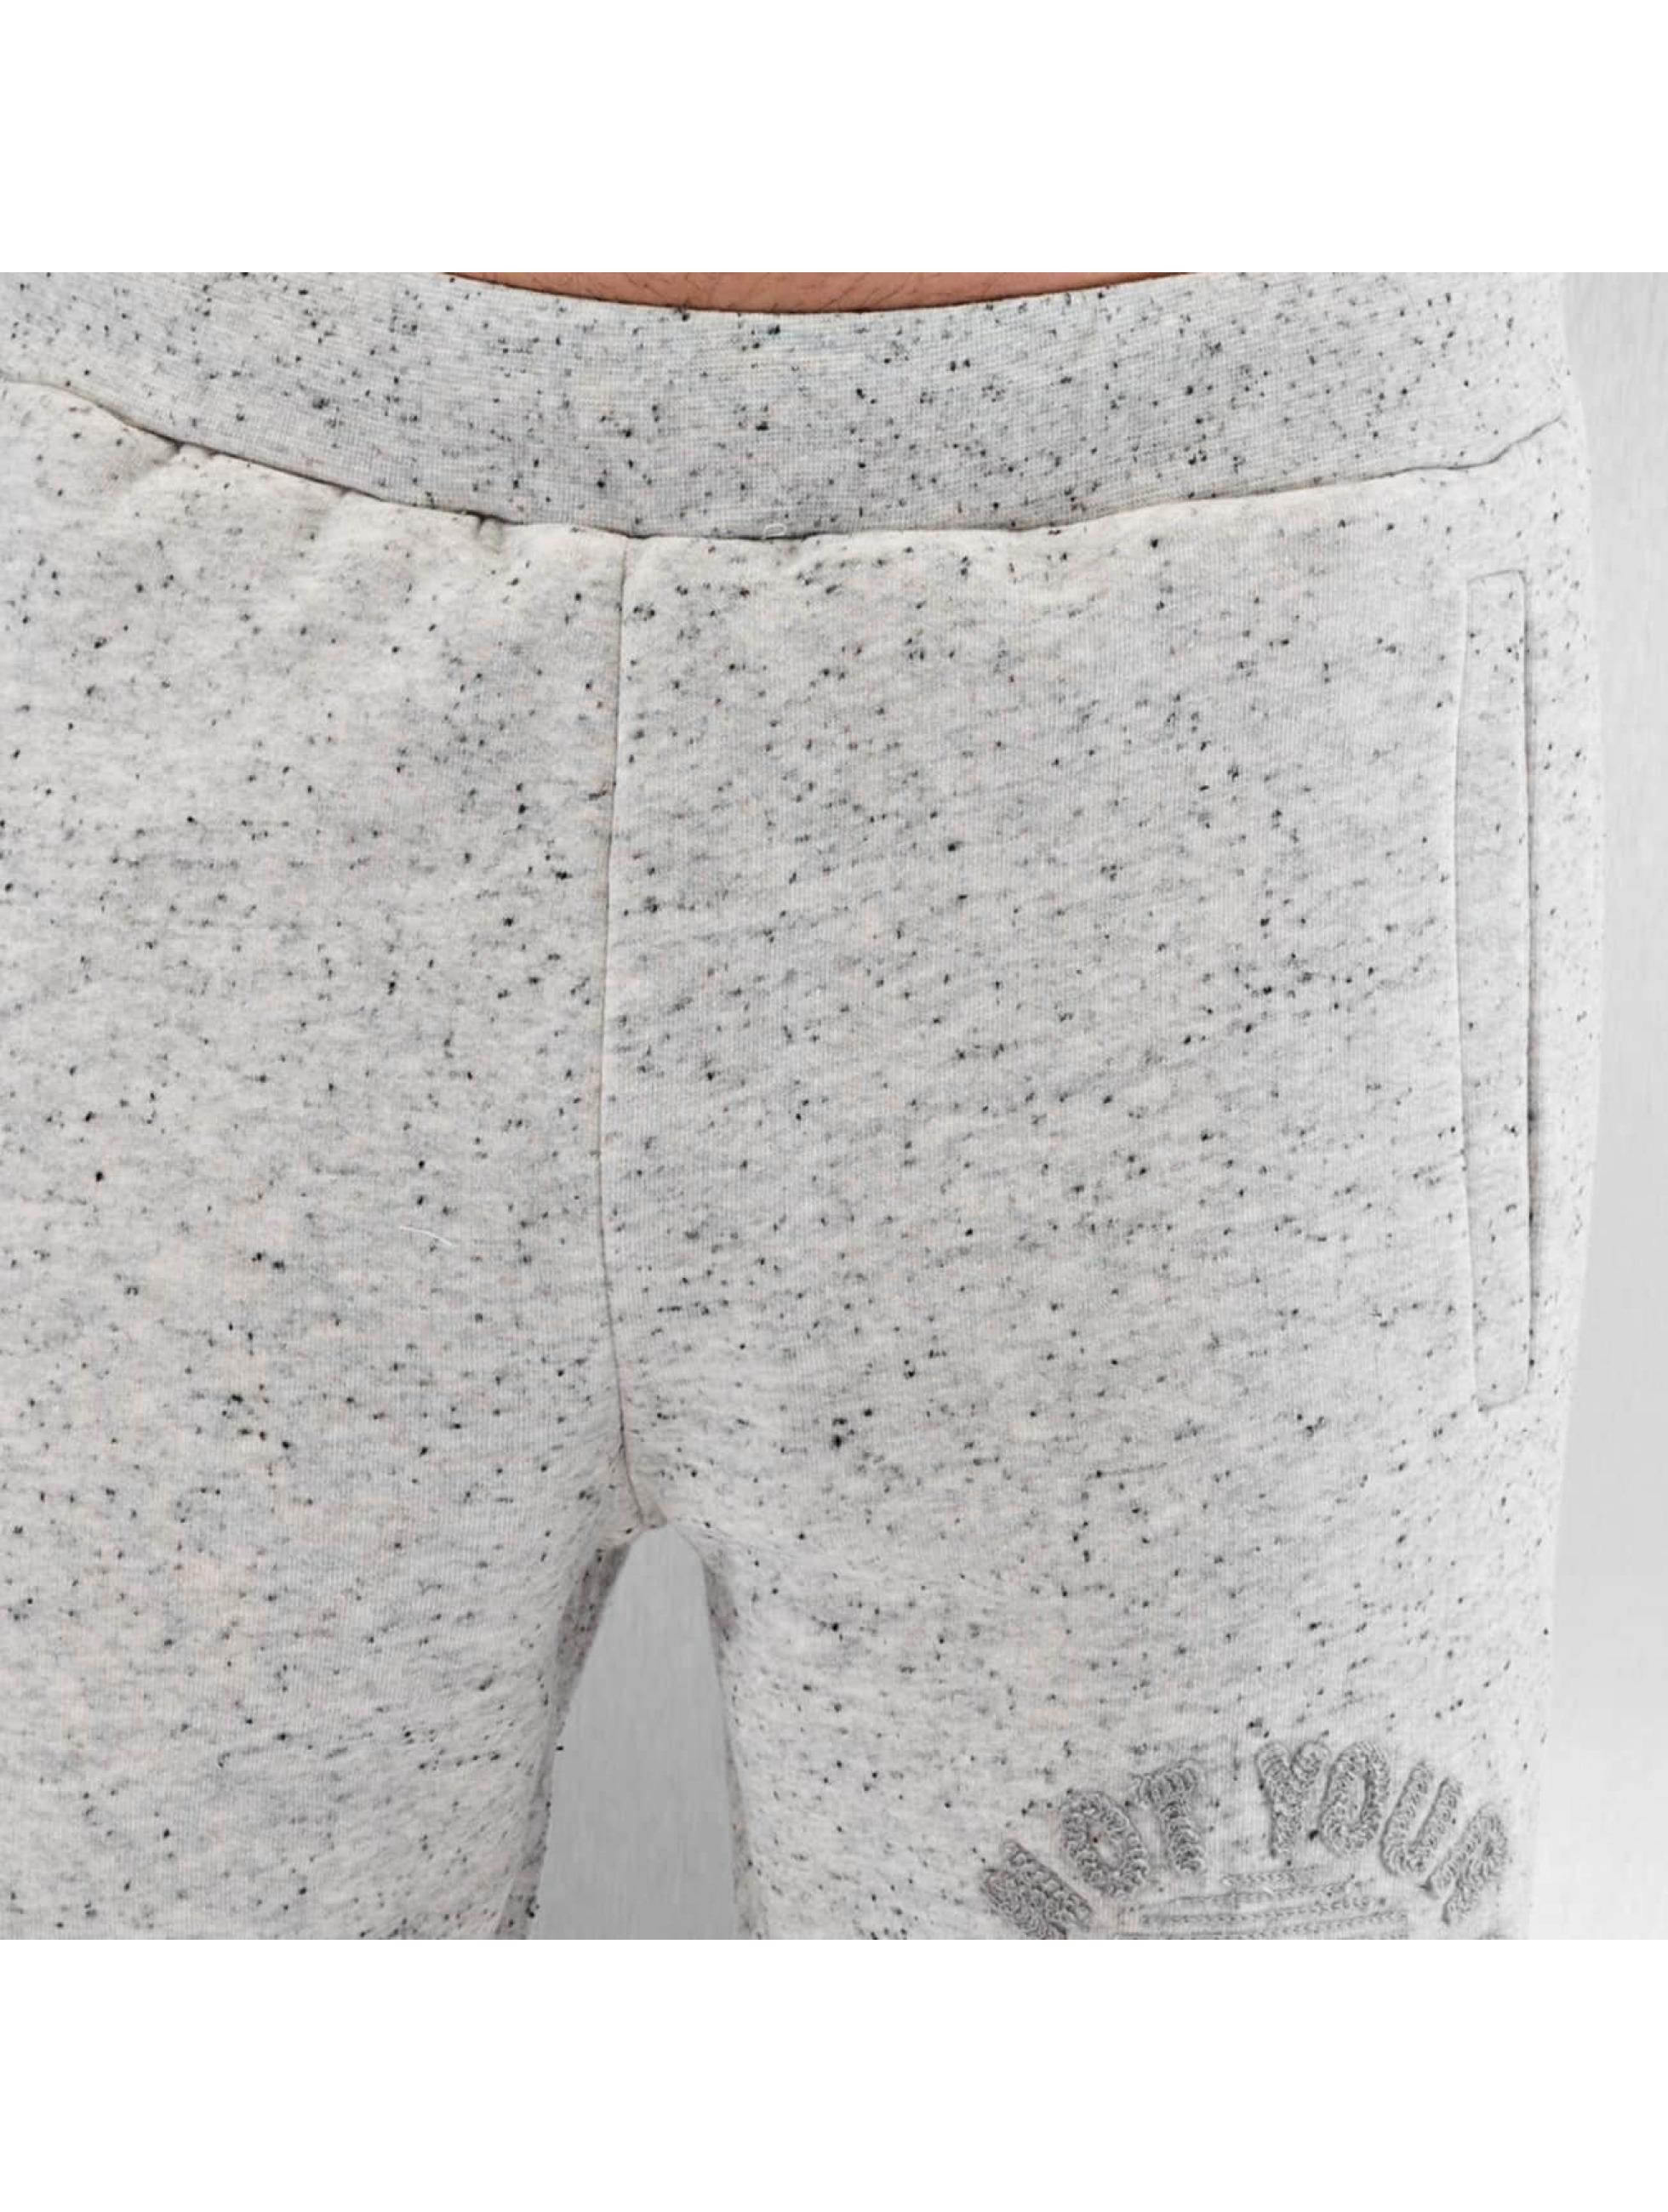 Pelle Pelle Spodnie do joggingu Not Your Average szary